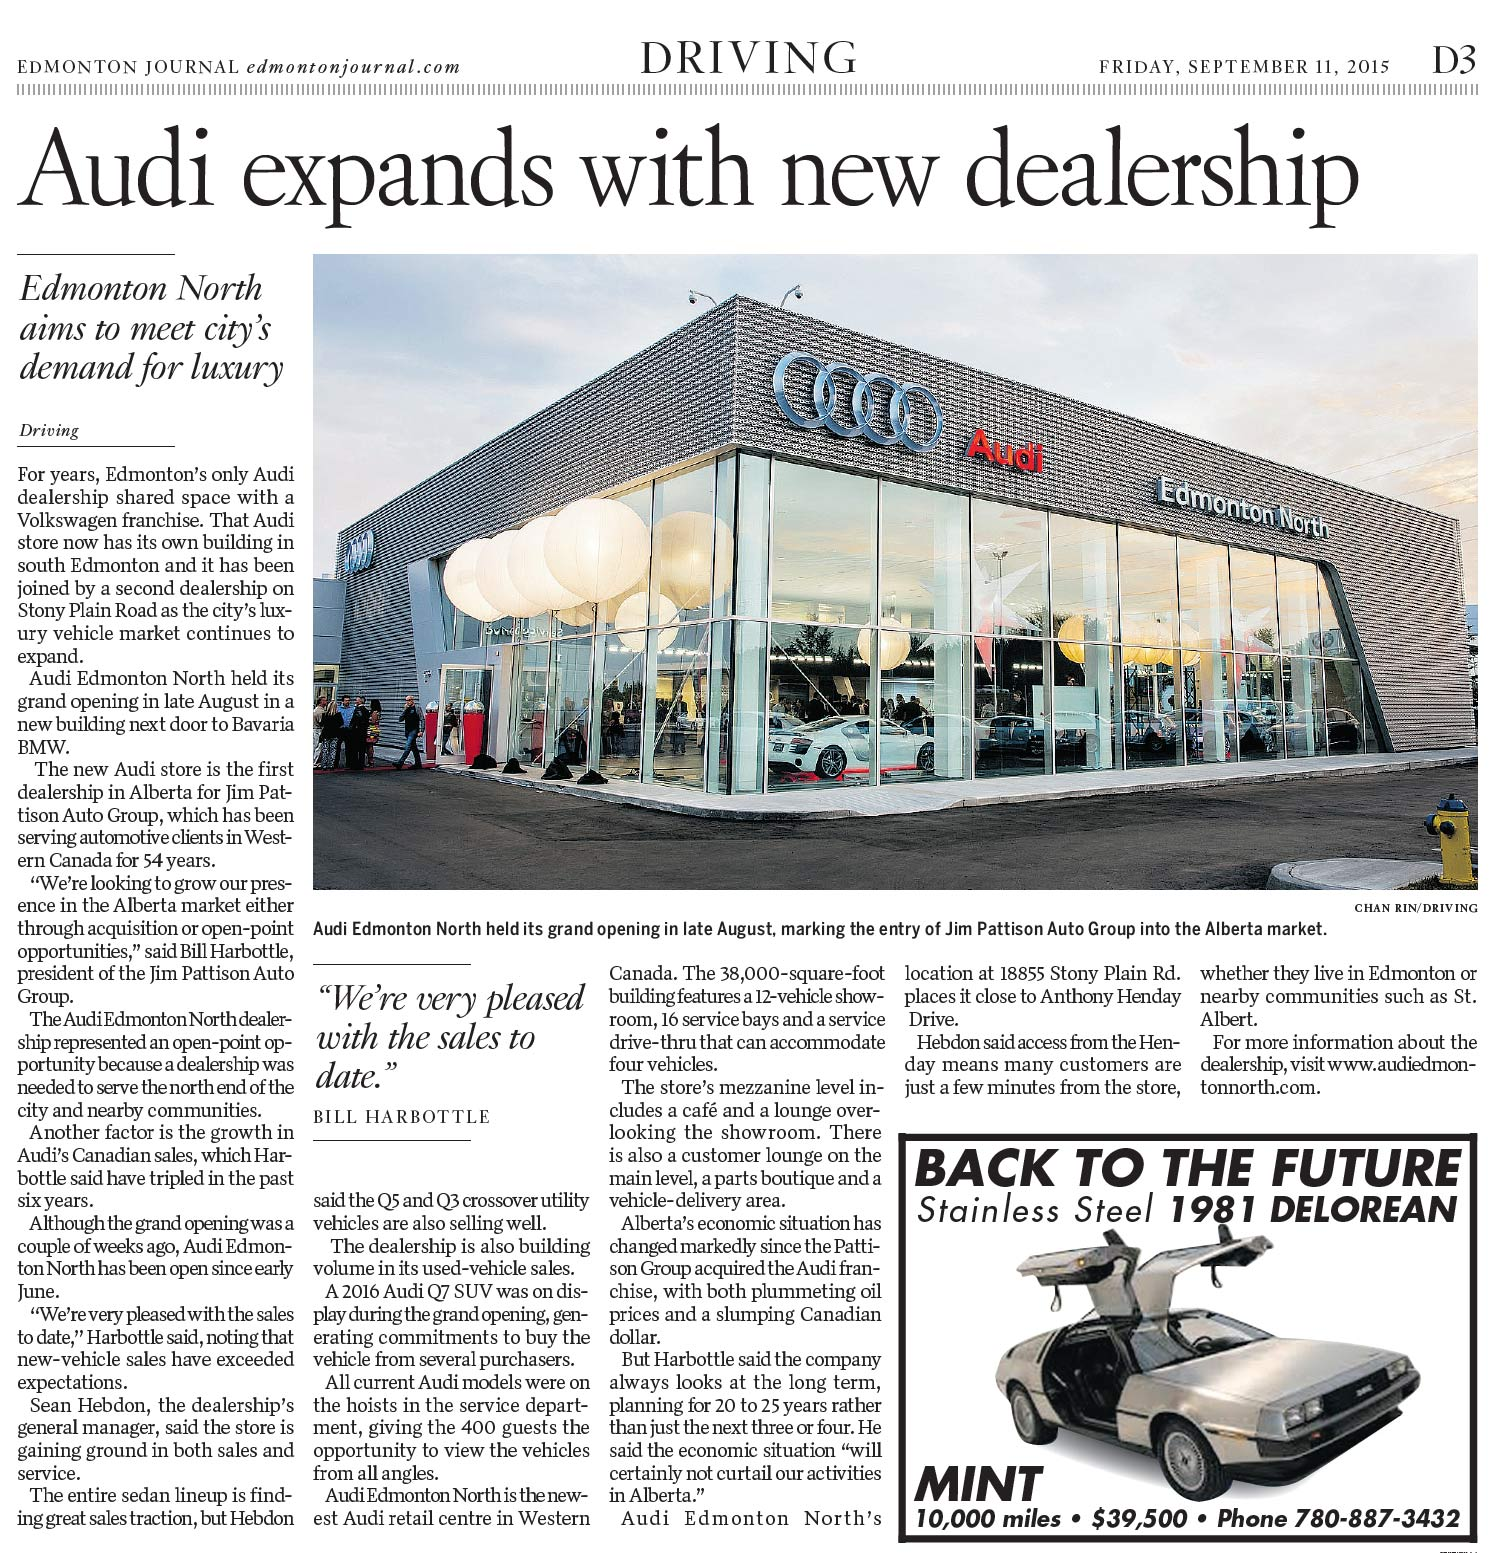 EdmontonJournal-Audi